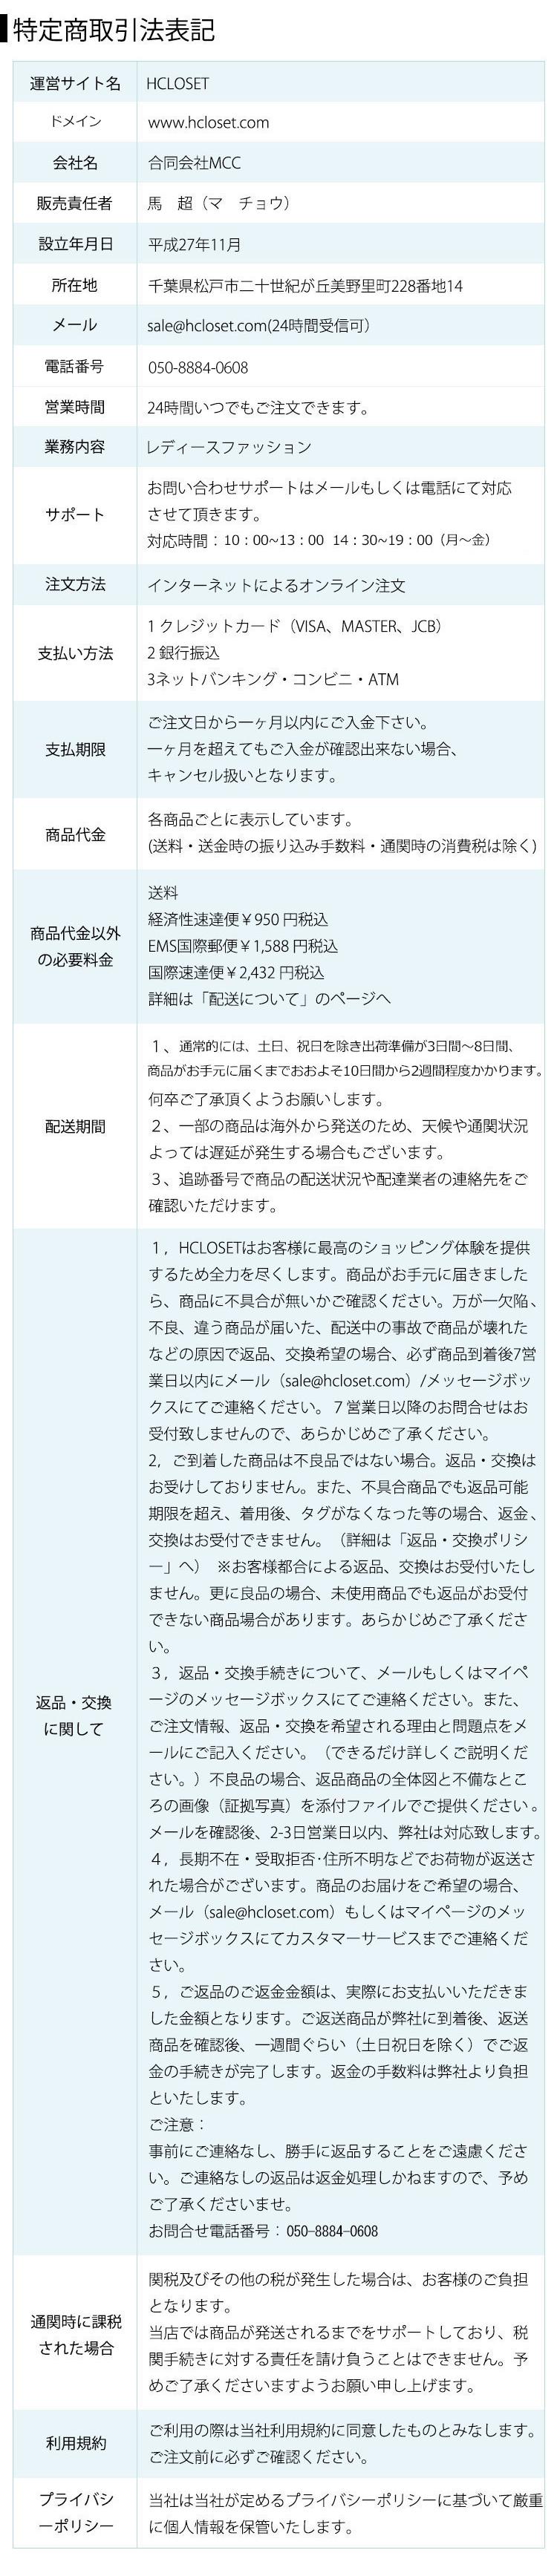 3-company-PC.jpg